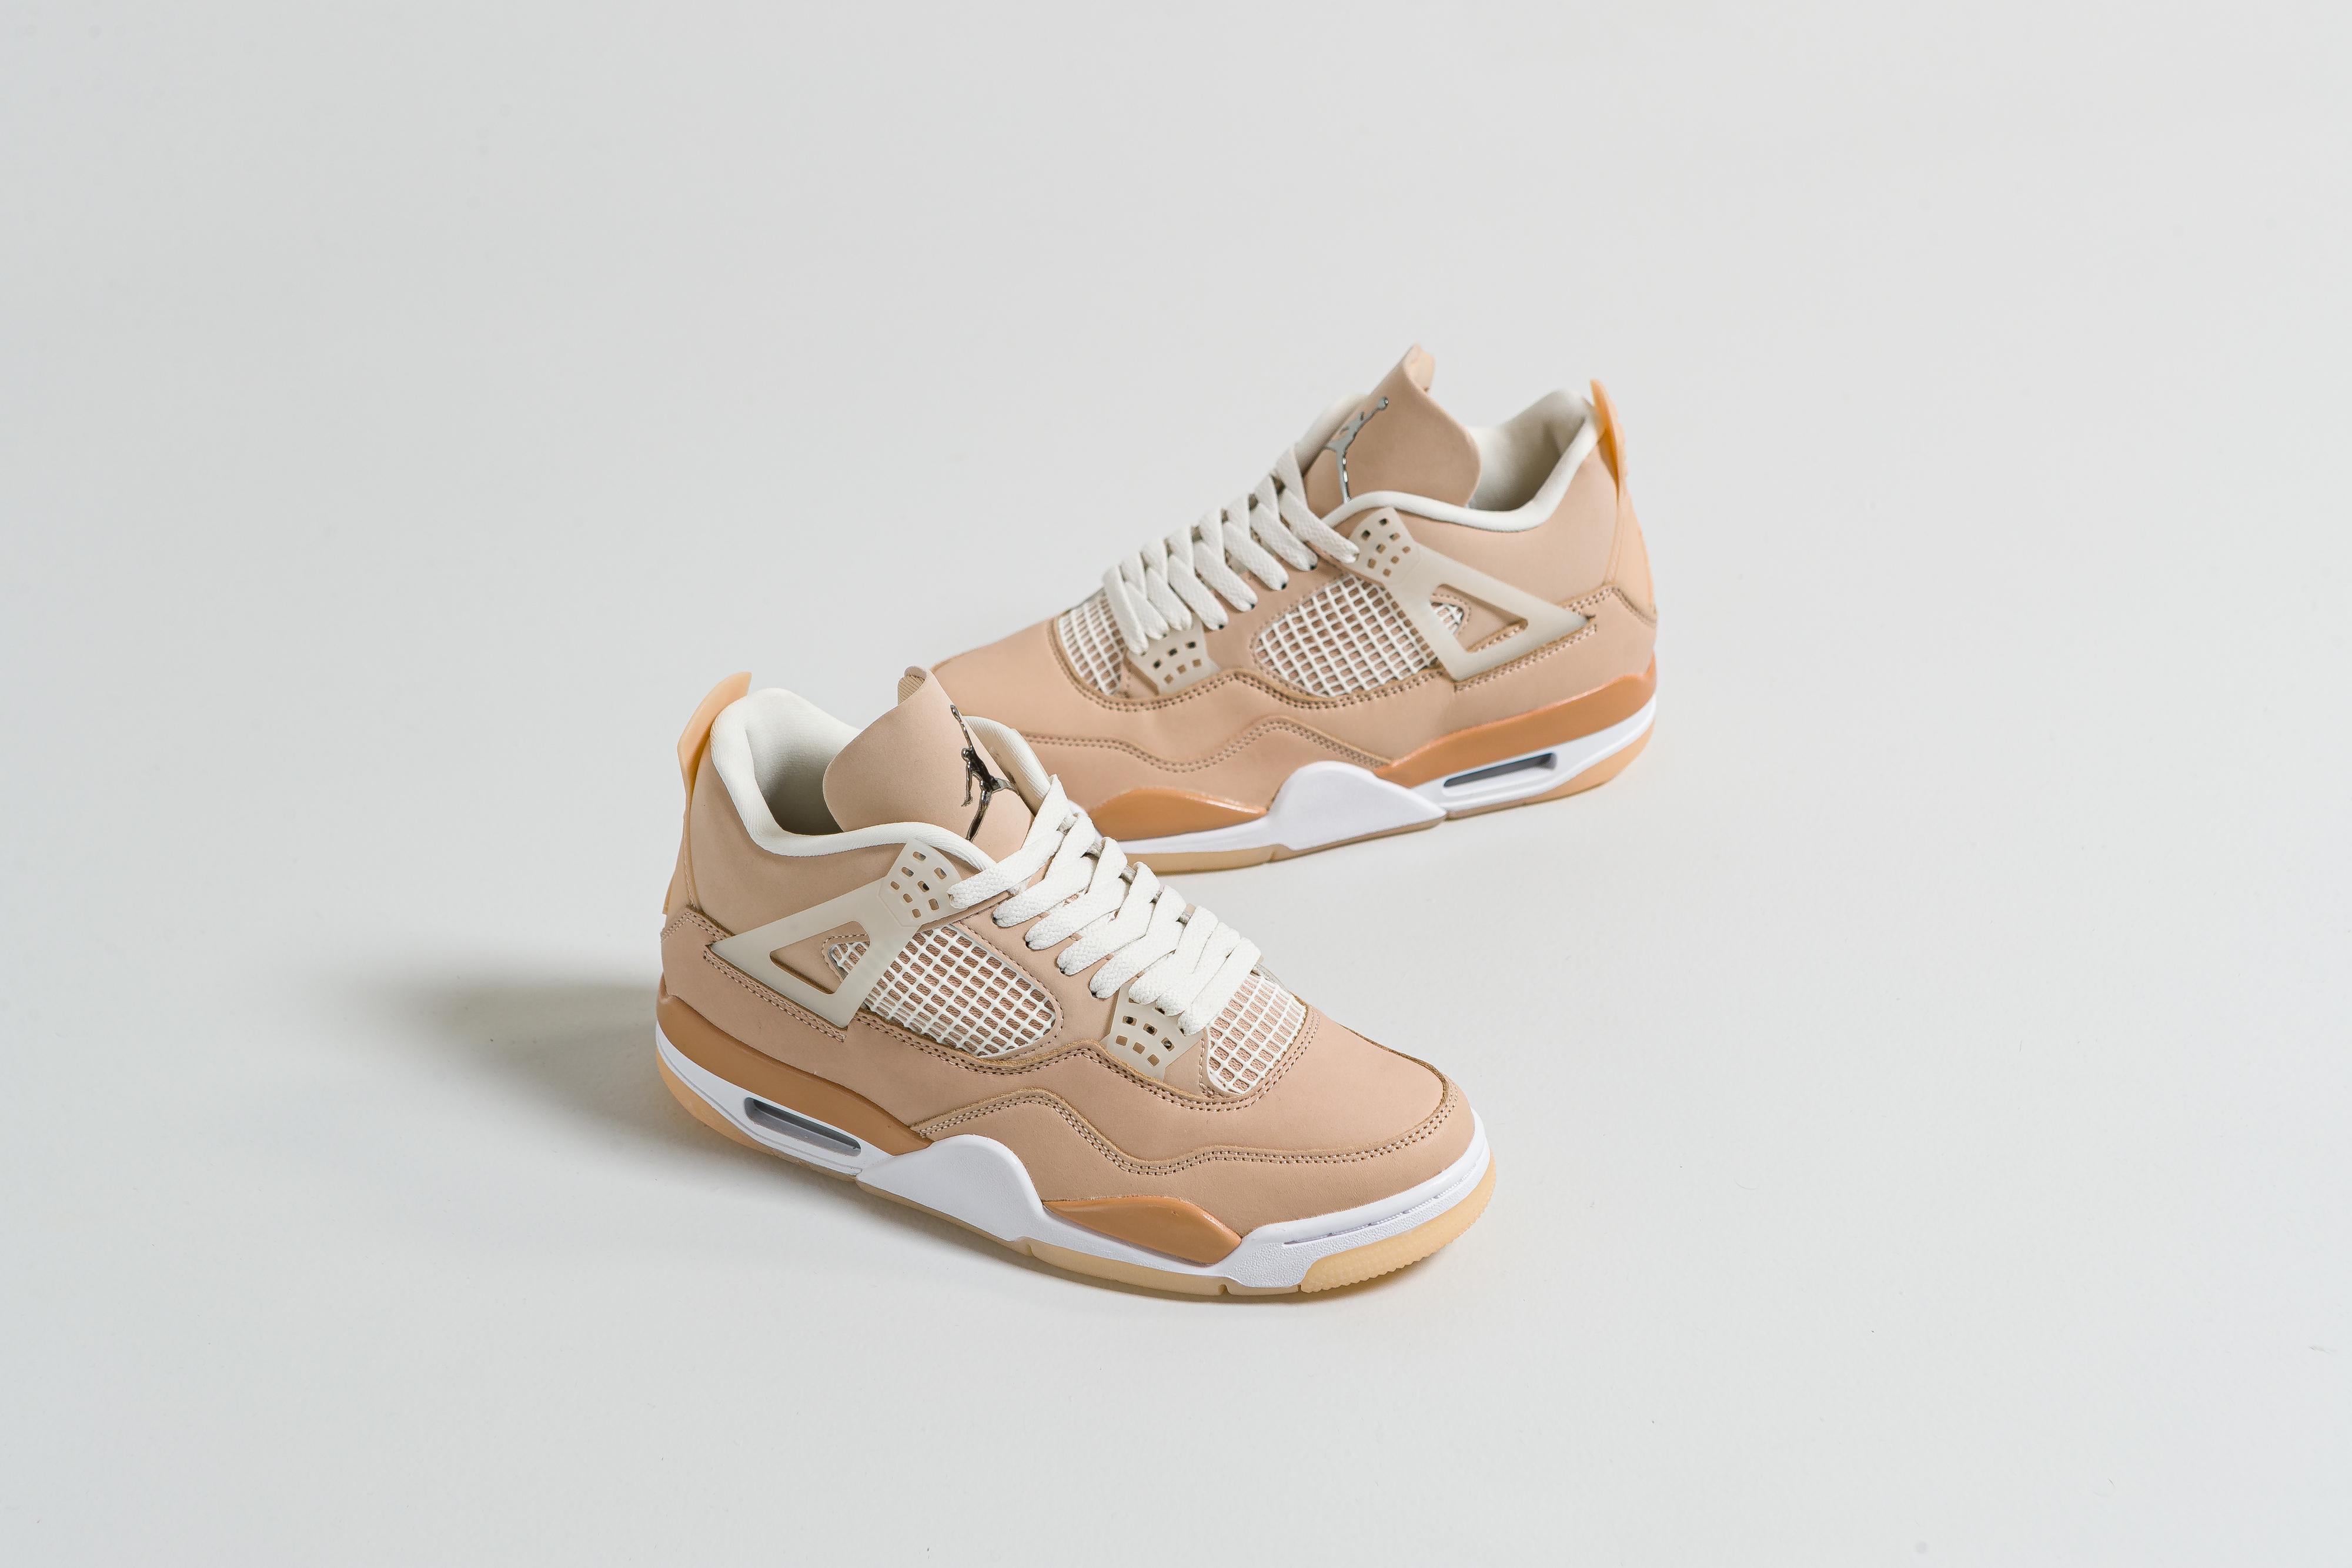 Jordan - Womens Air Jordan 4 Retro - Shimmer/Metallic Silver-Orange Quartz - Up There